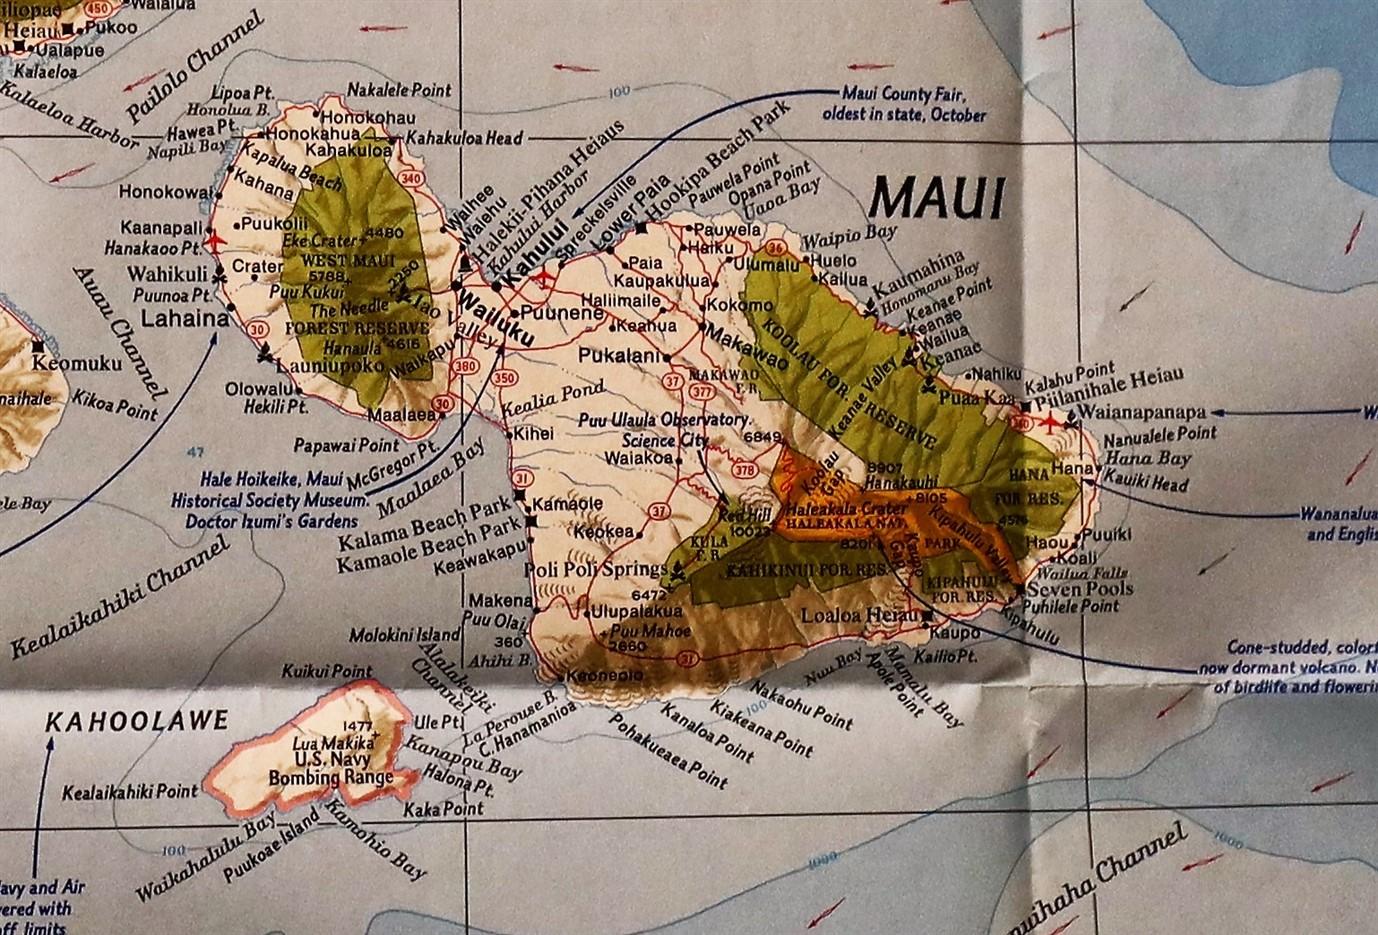 National Geographic Hawaii 1976 6.jpg